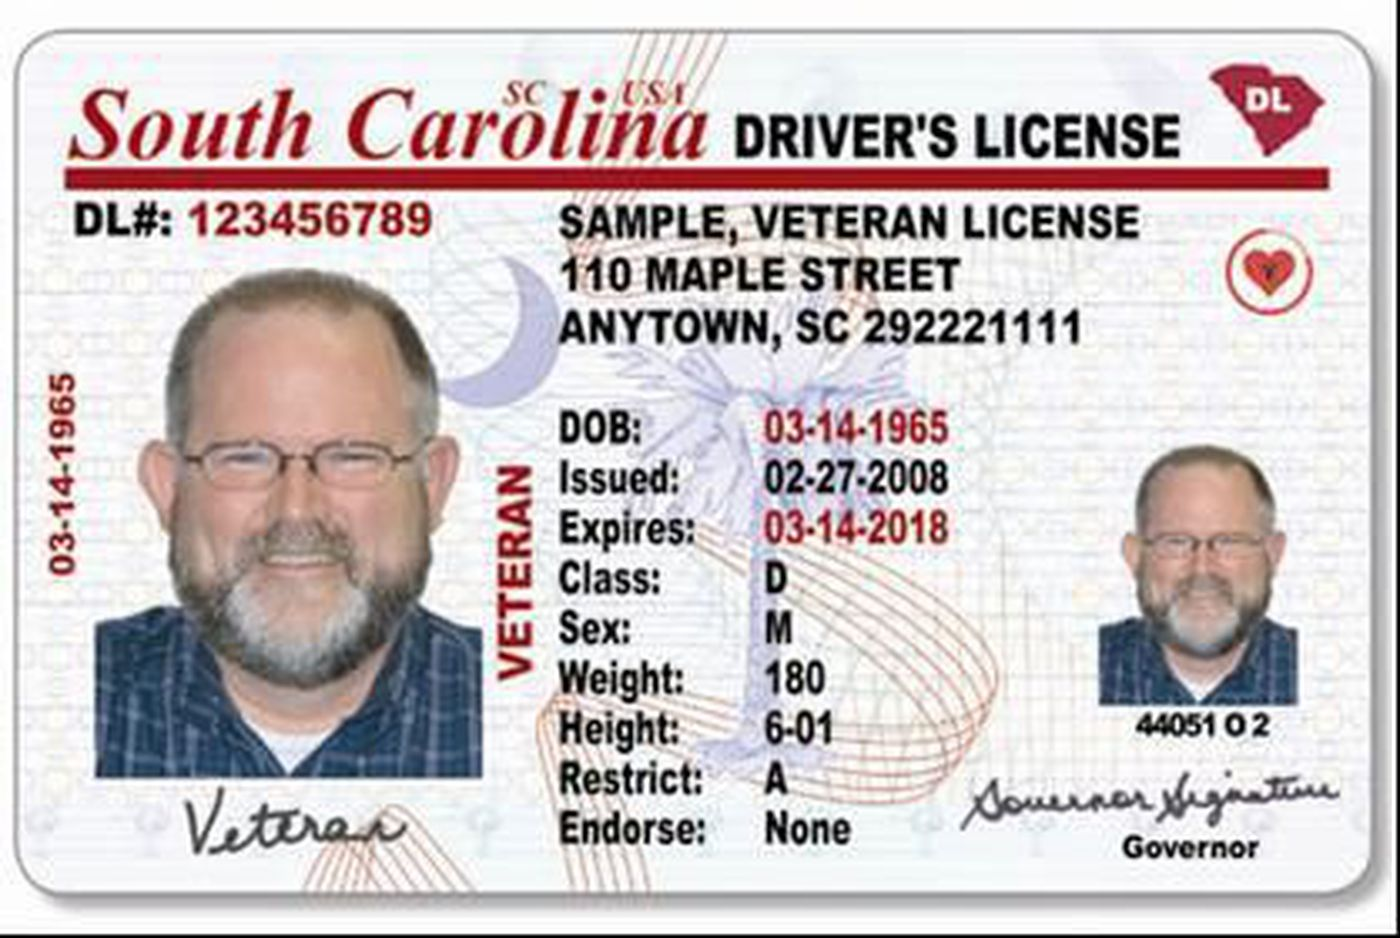 obtaining a south carolina drivers license